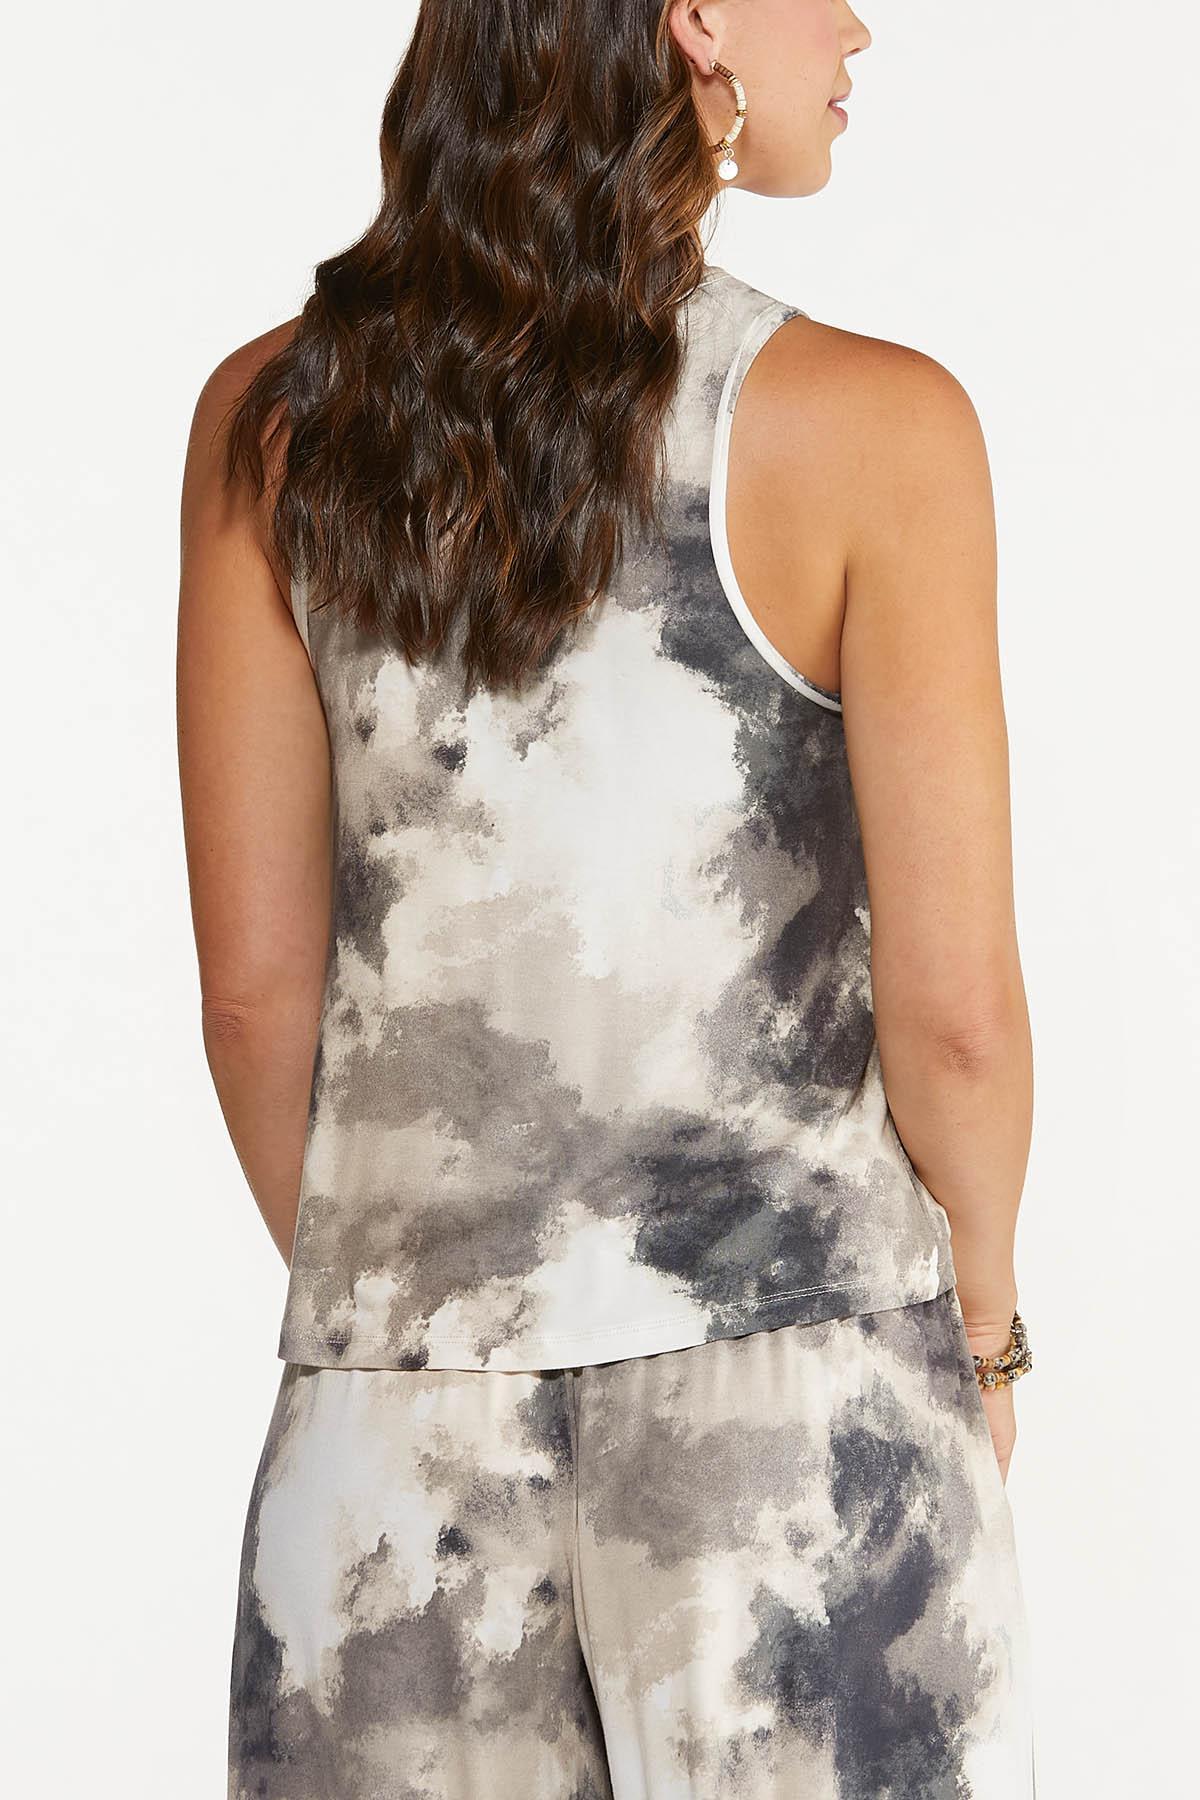 Black And White Tie Dye Tank (Item #44661827)